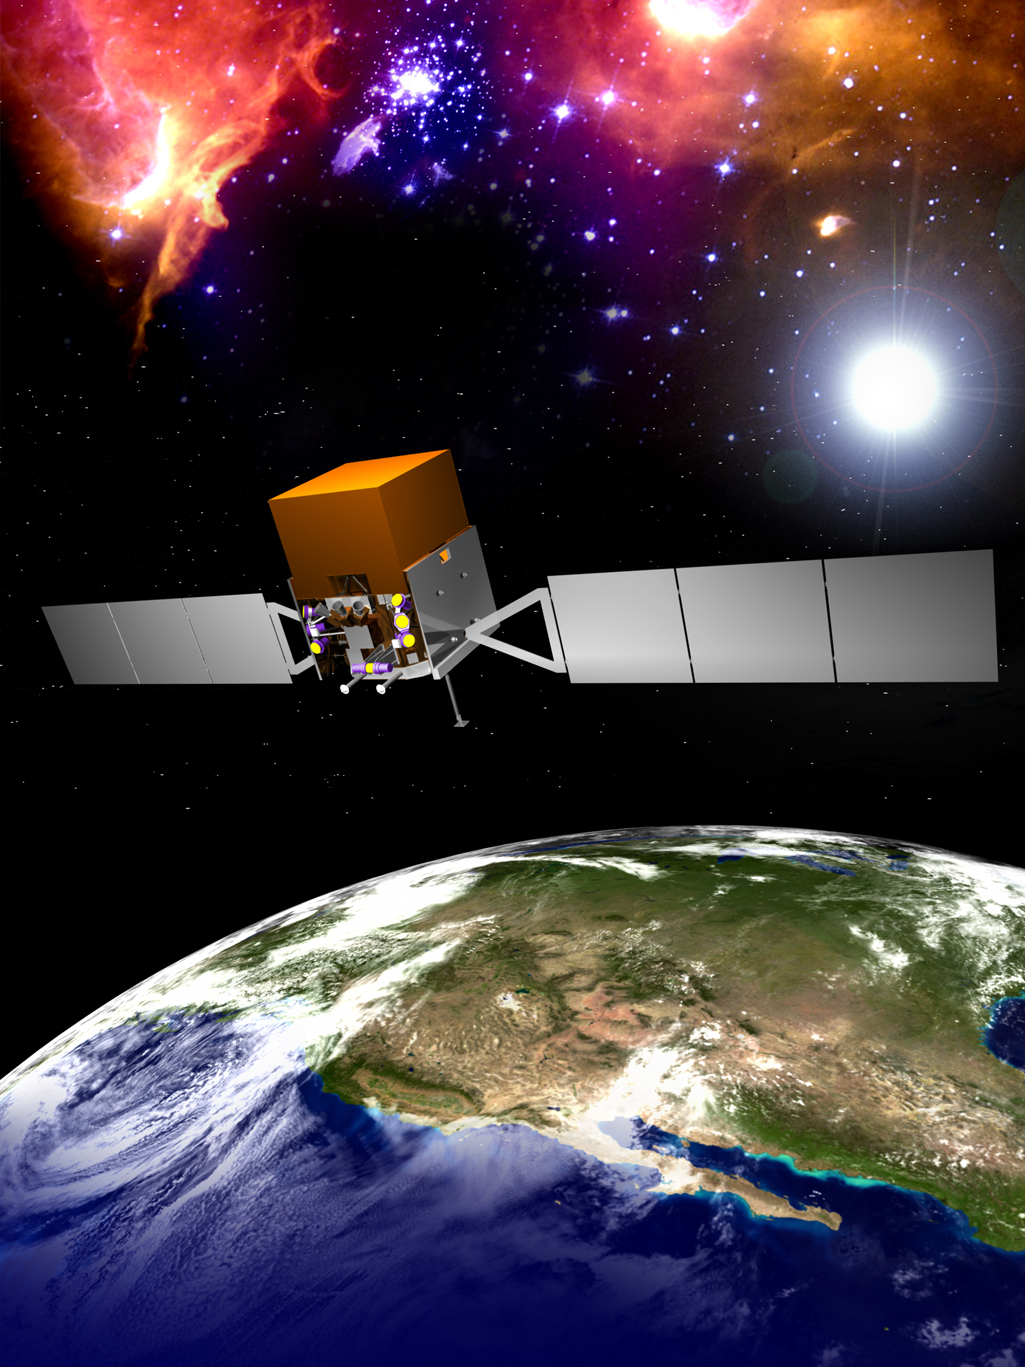 nasa space research - photo #6